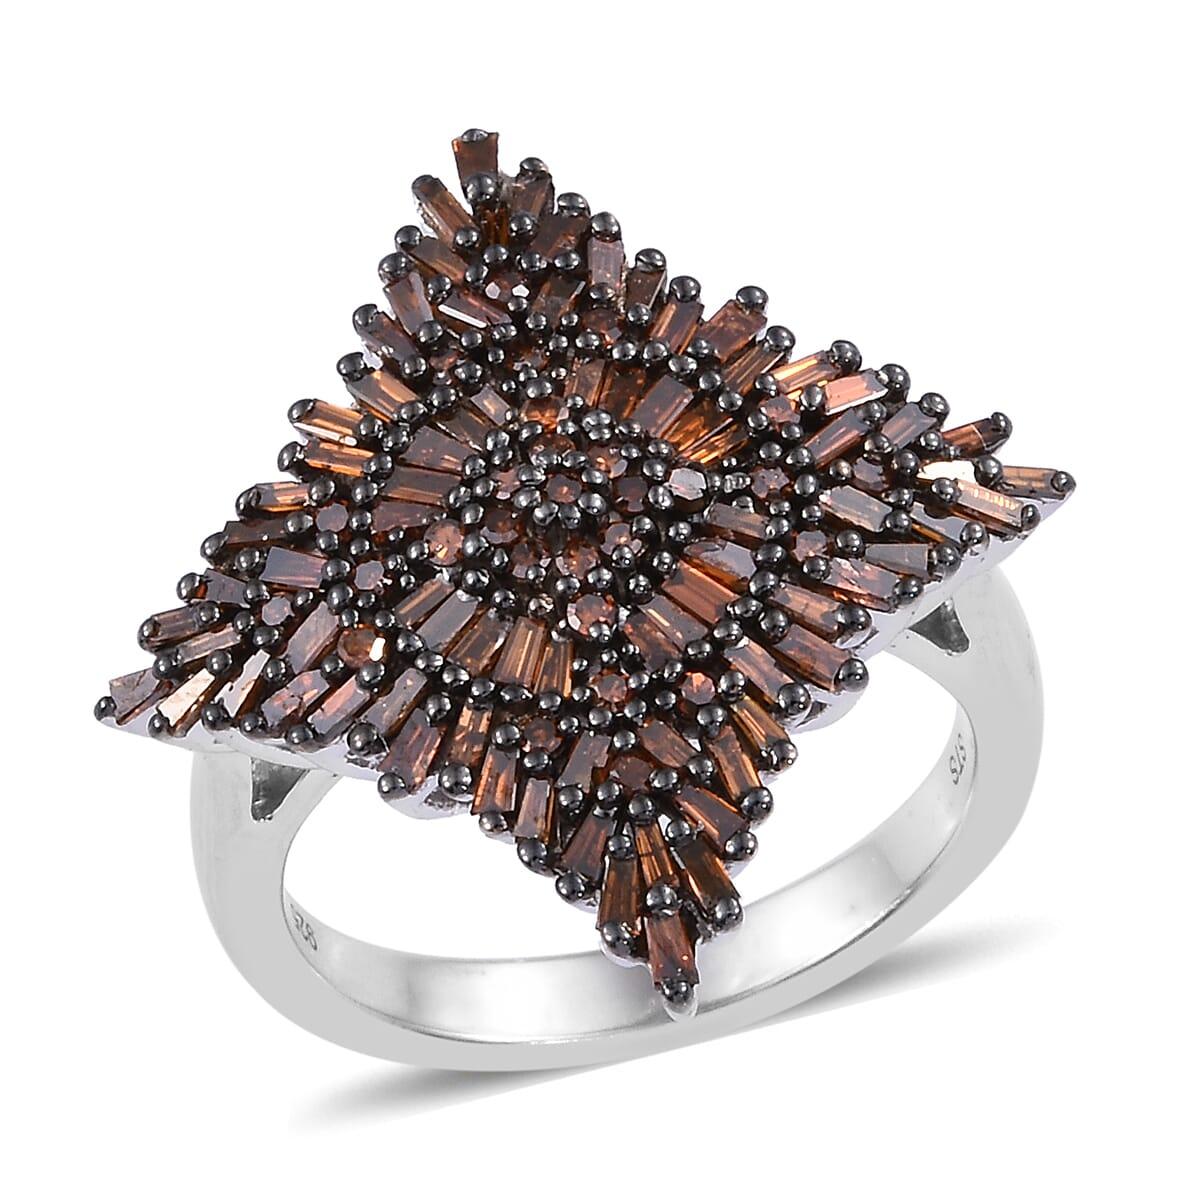 Array - red diamond  ir  ring in black rhodium  u0026 platinum over sterling silver  size 6 0  1 00 ctw  rh   shoplc com